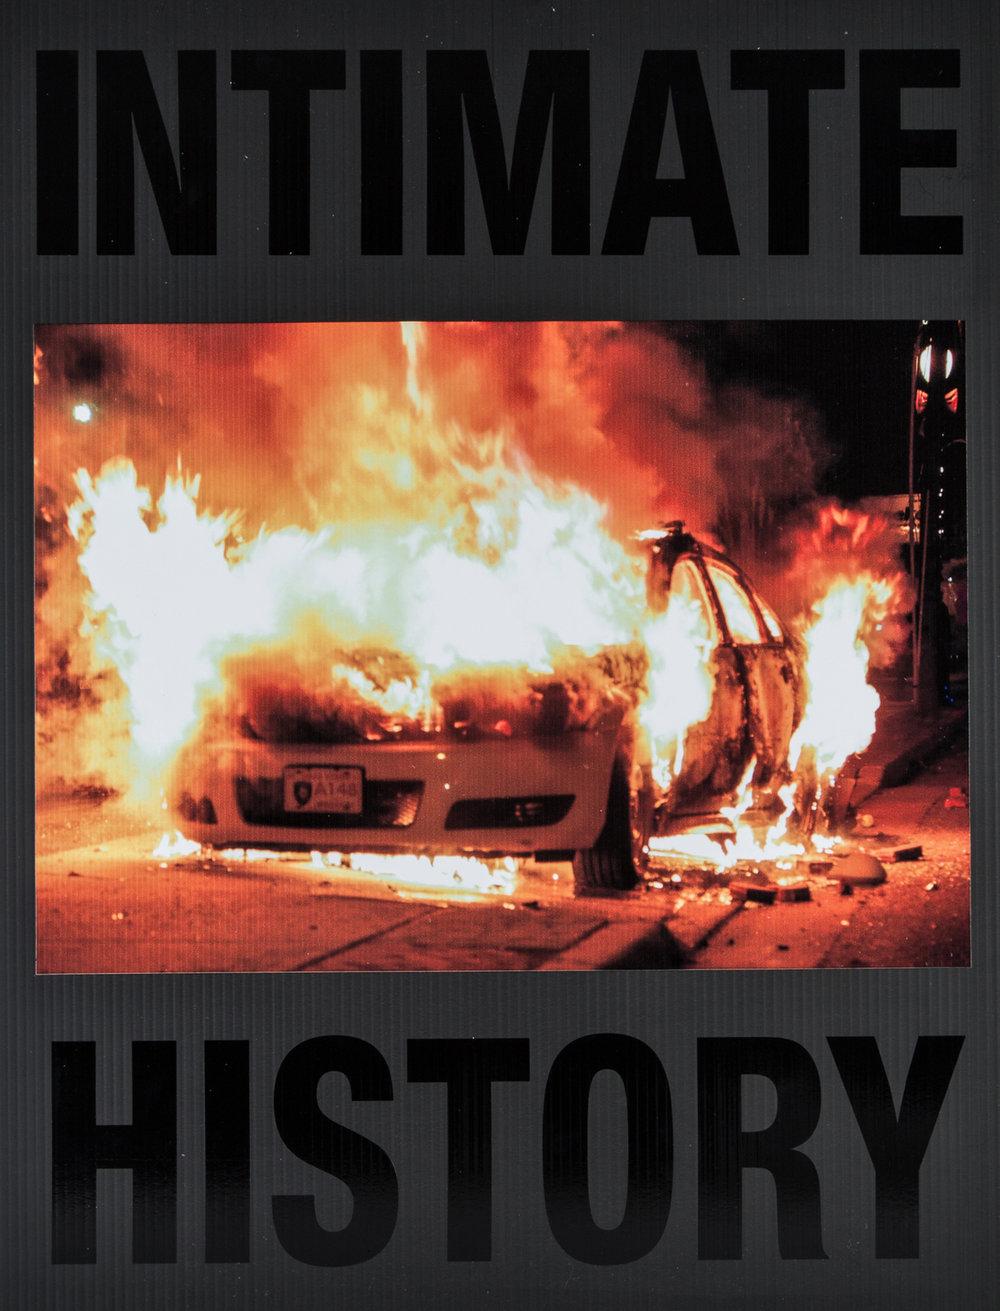 cali-dewitt-intimate-history-2.jpg